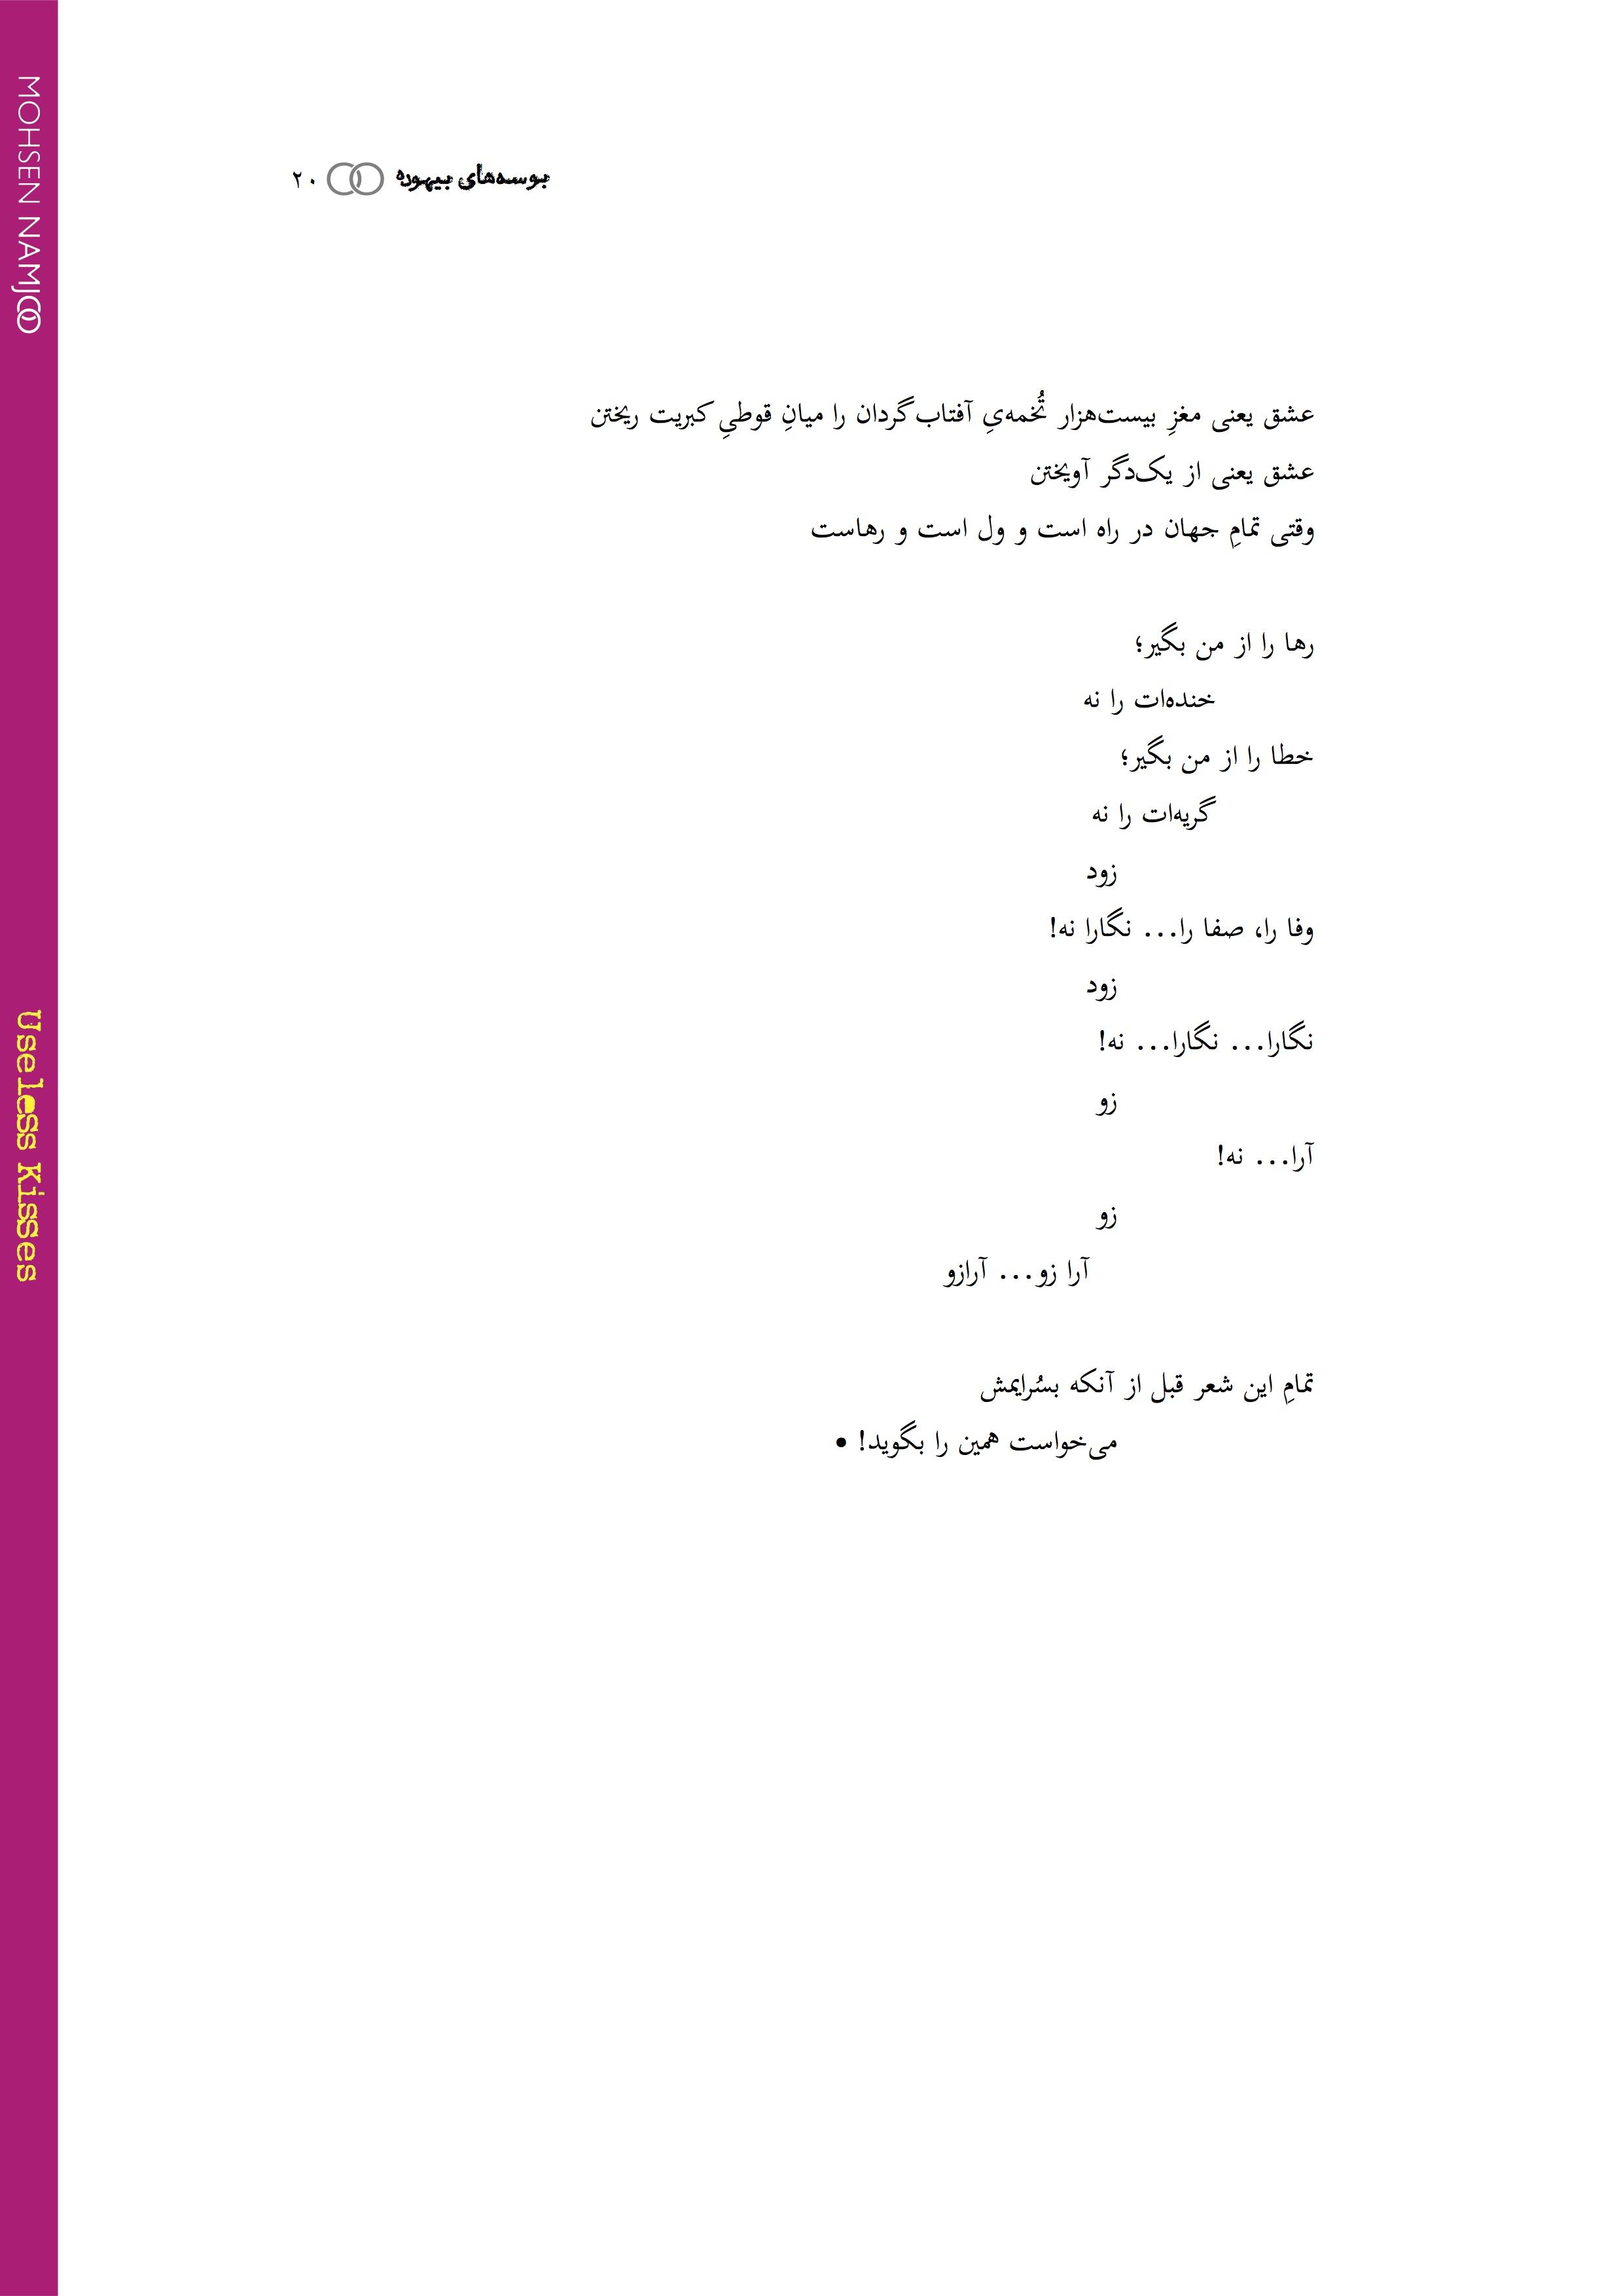 19Useless Kisses eBook (2nd Edition).jpg